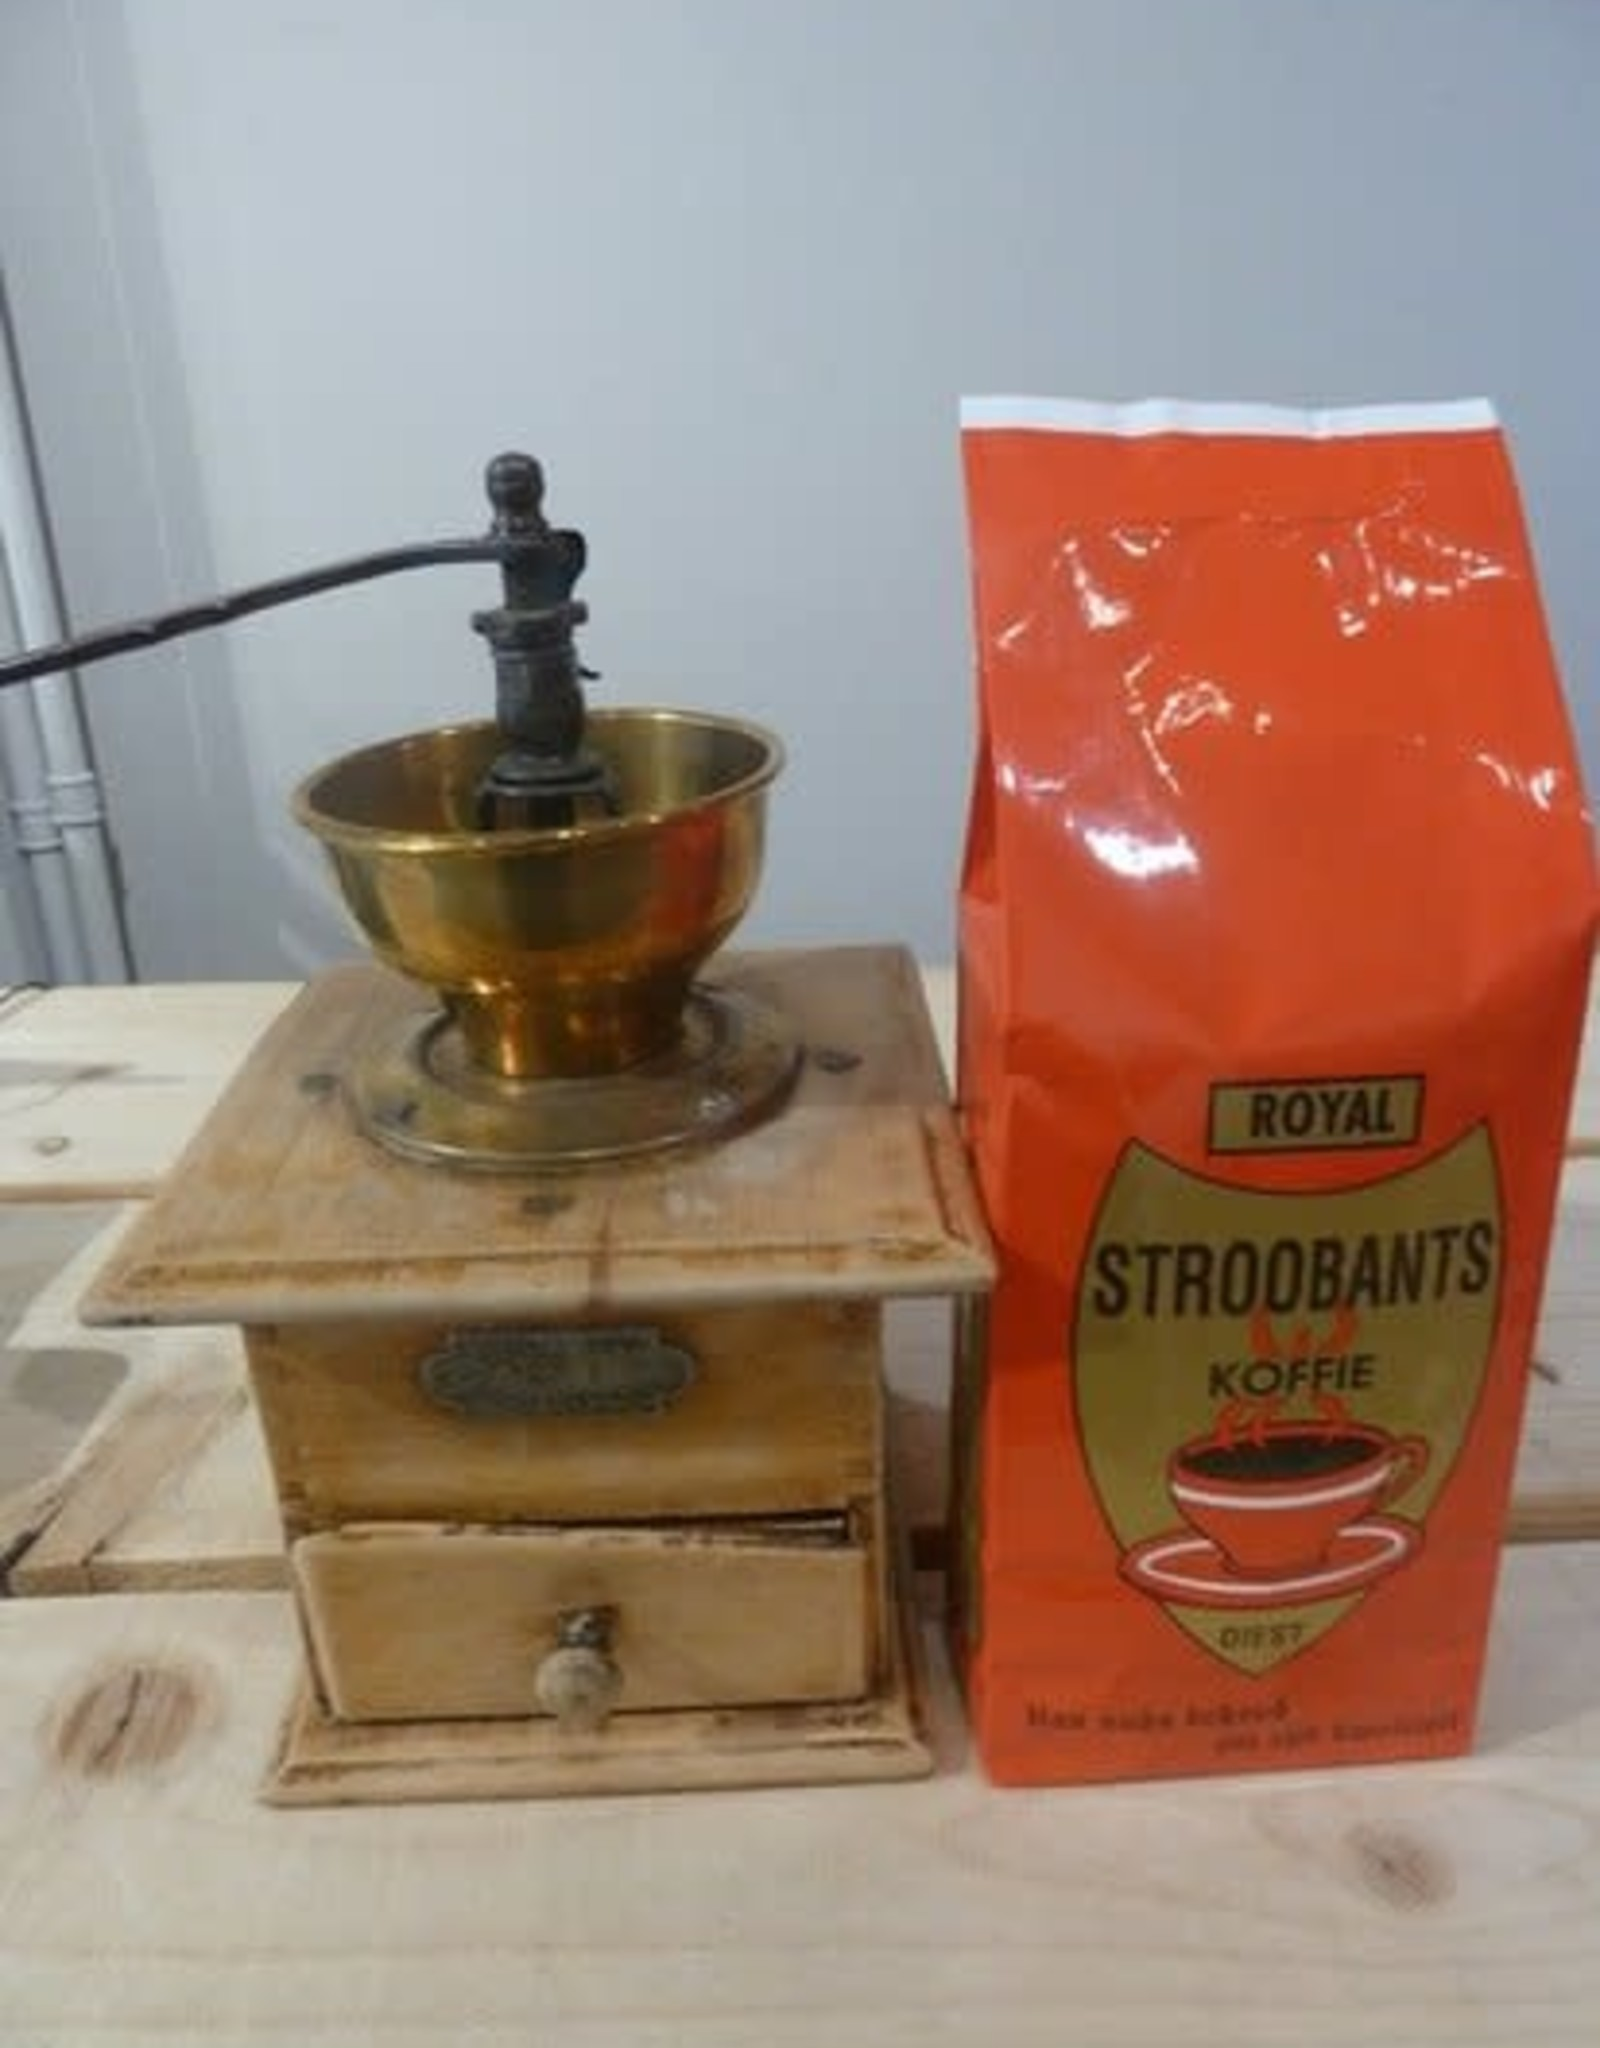 Stroobants Stroobants Royal koffie gemalen (500g)